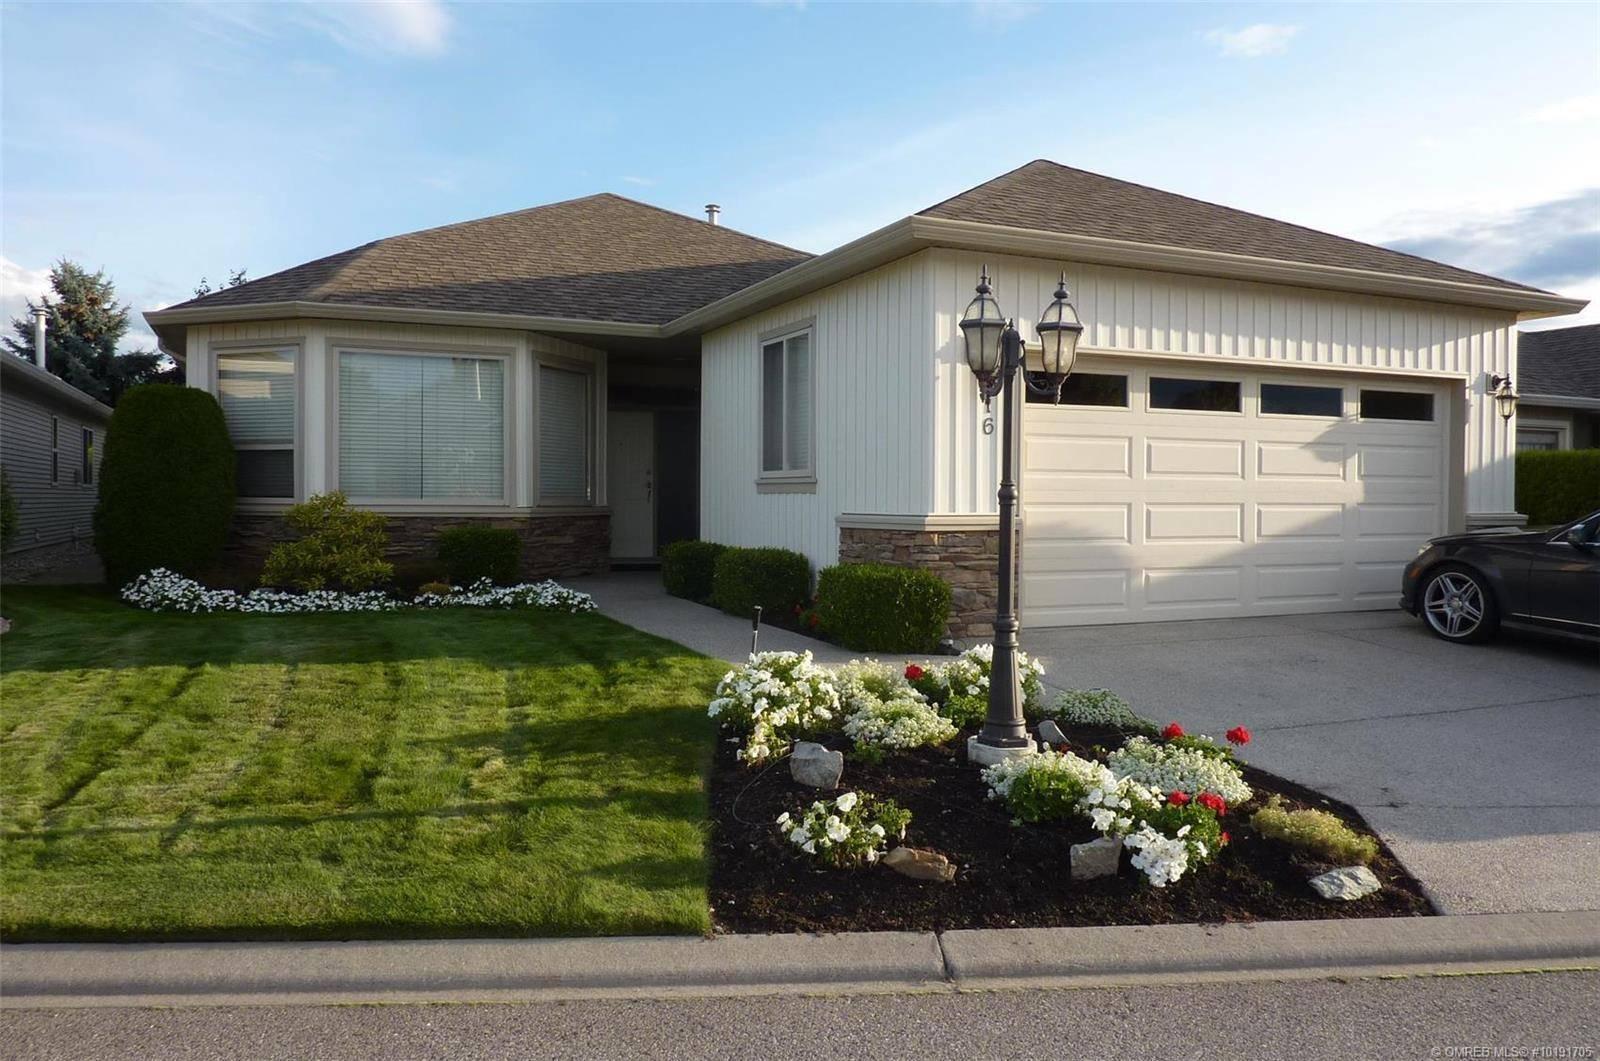 House for sale at 2365 Stillingfleet Rd Unit 216 Kelowna British Columbia - MLS: 10191705